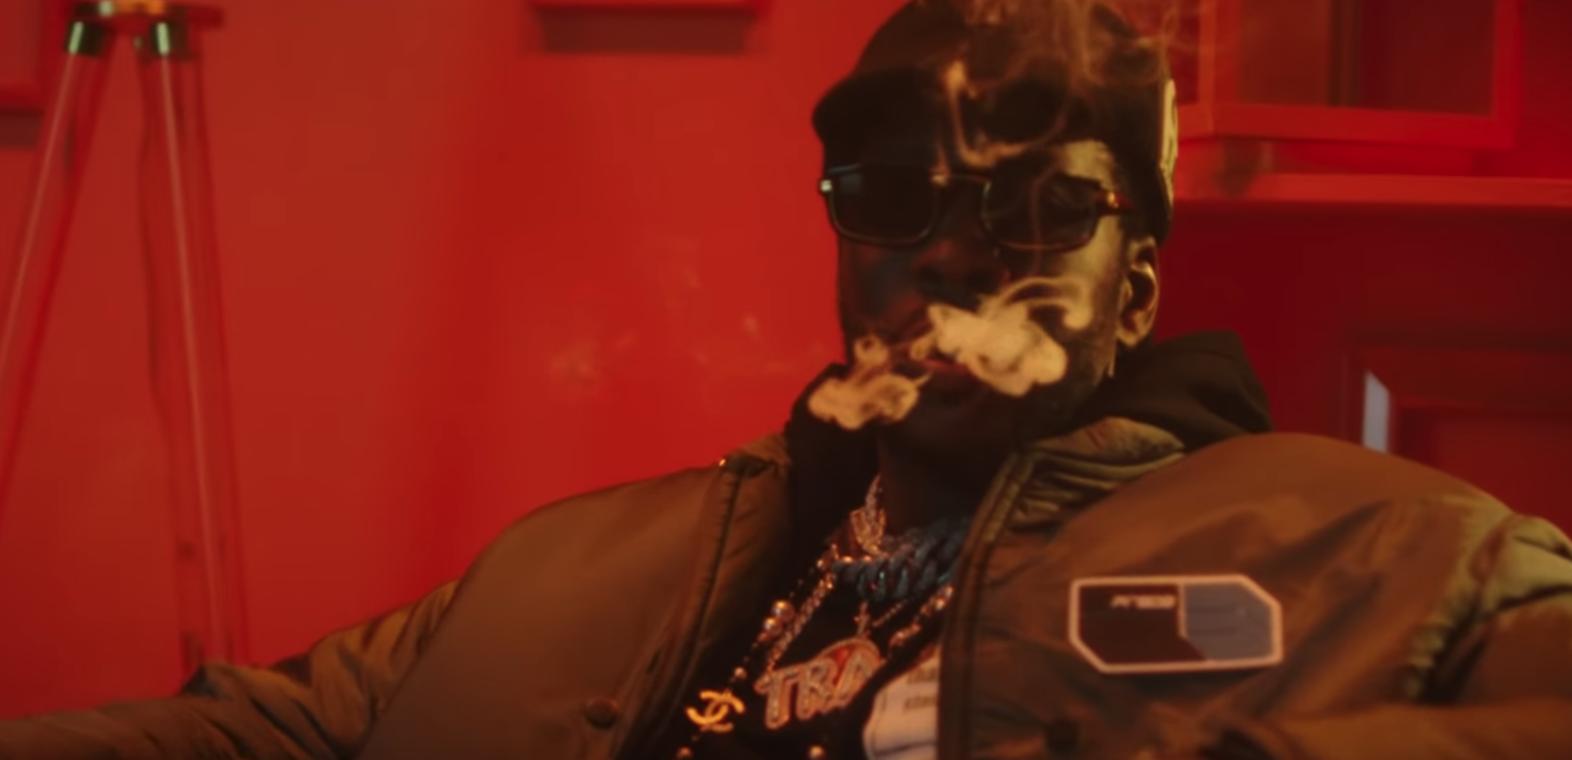 Yella Beezy feat. Rich The Kid, T.I., Boosie Badazz, Trapboy Freddie, 2 Chainz, & Jeezy - That's On Me (Remix)